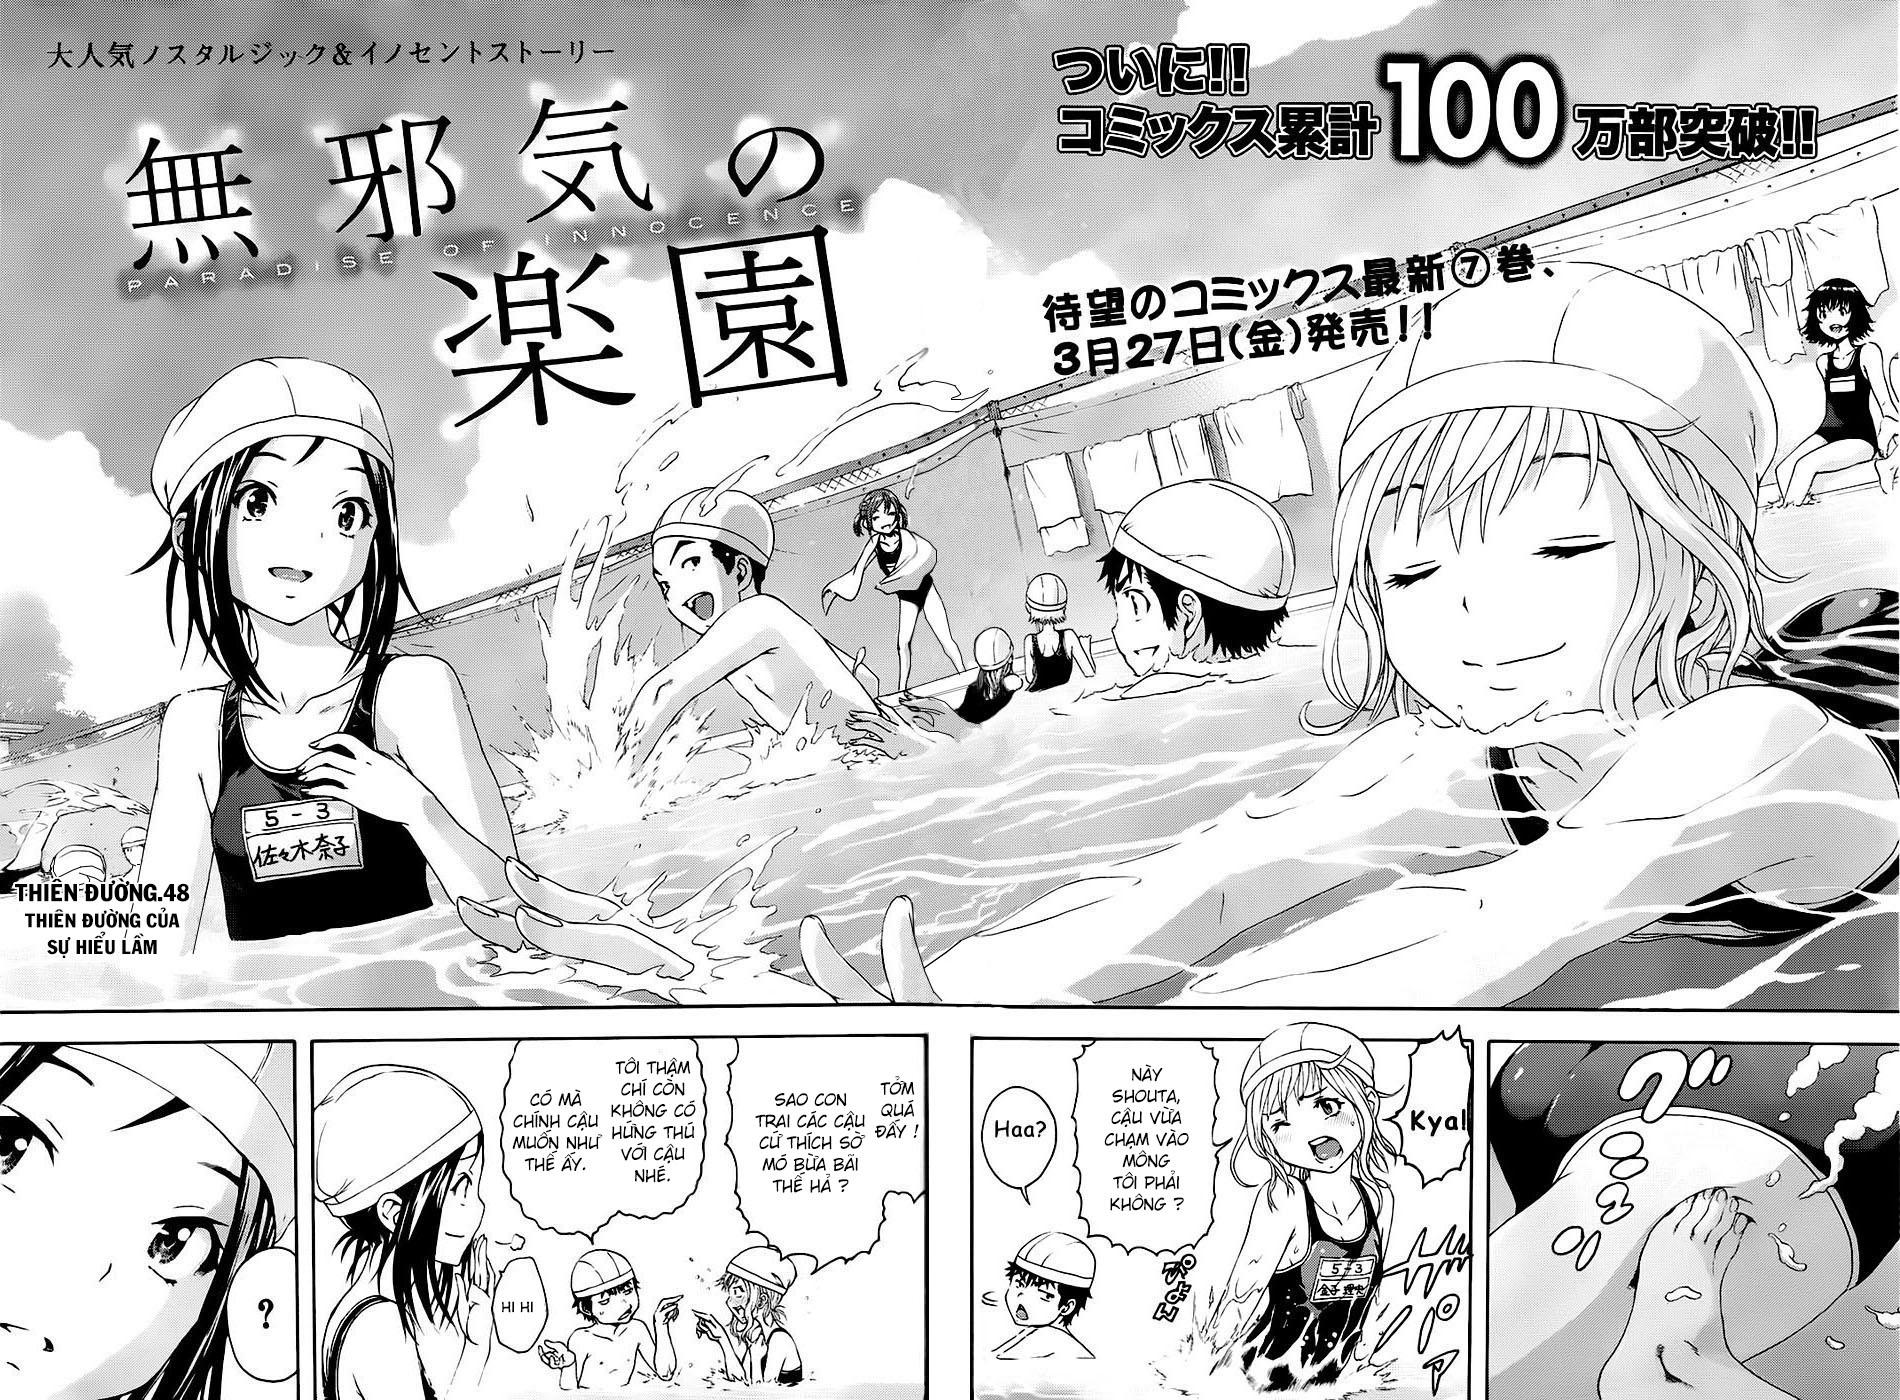 Hình ảnh Mujaki%2Bno%2Brakuen%2B %2Bchap%2B48001 in [Siêu phẩm] Mujaki no Rakuen Hentai Series